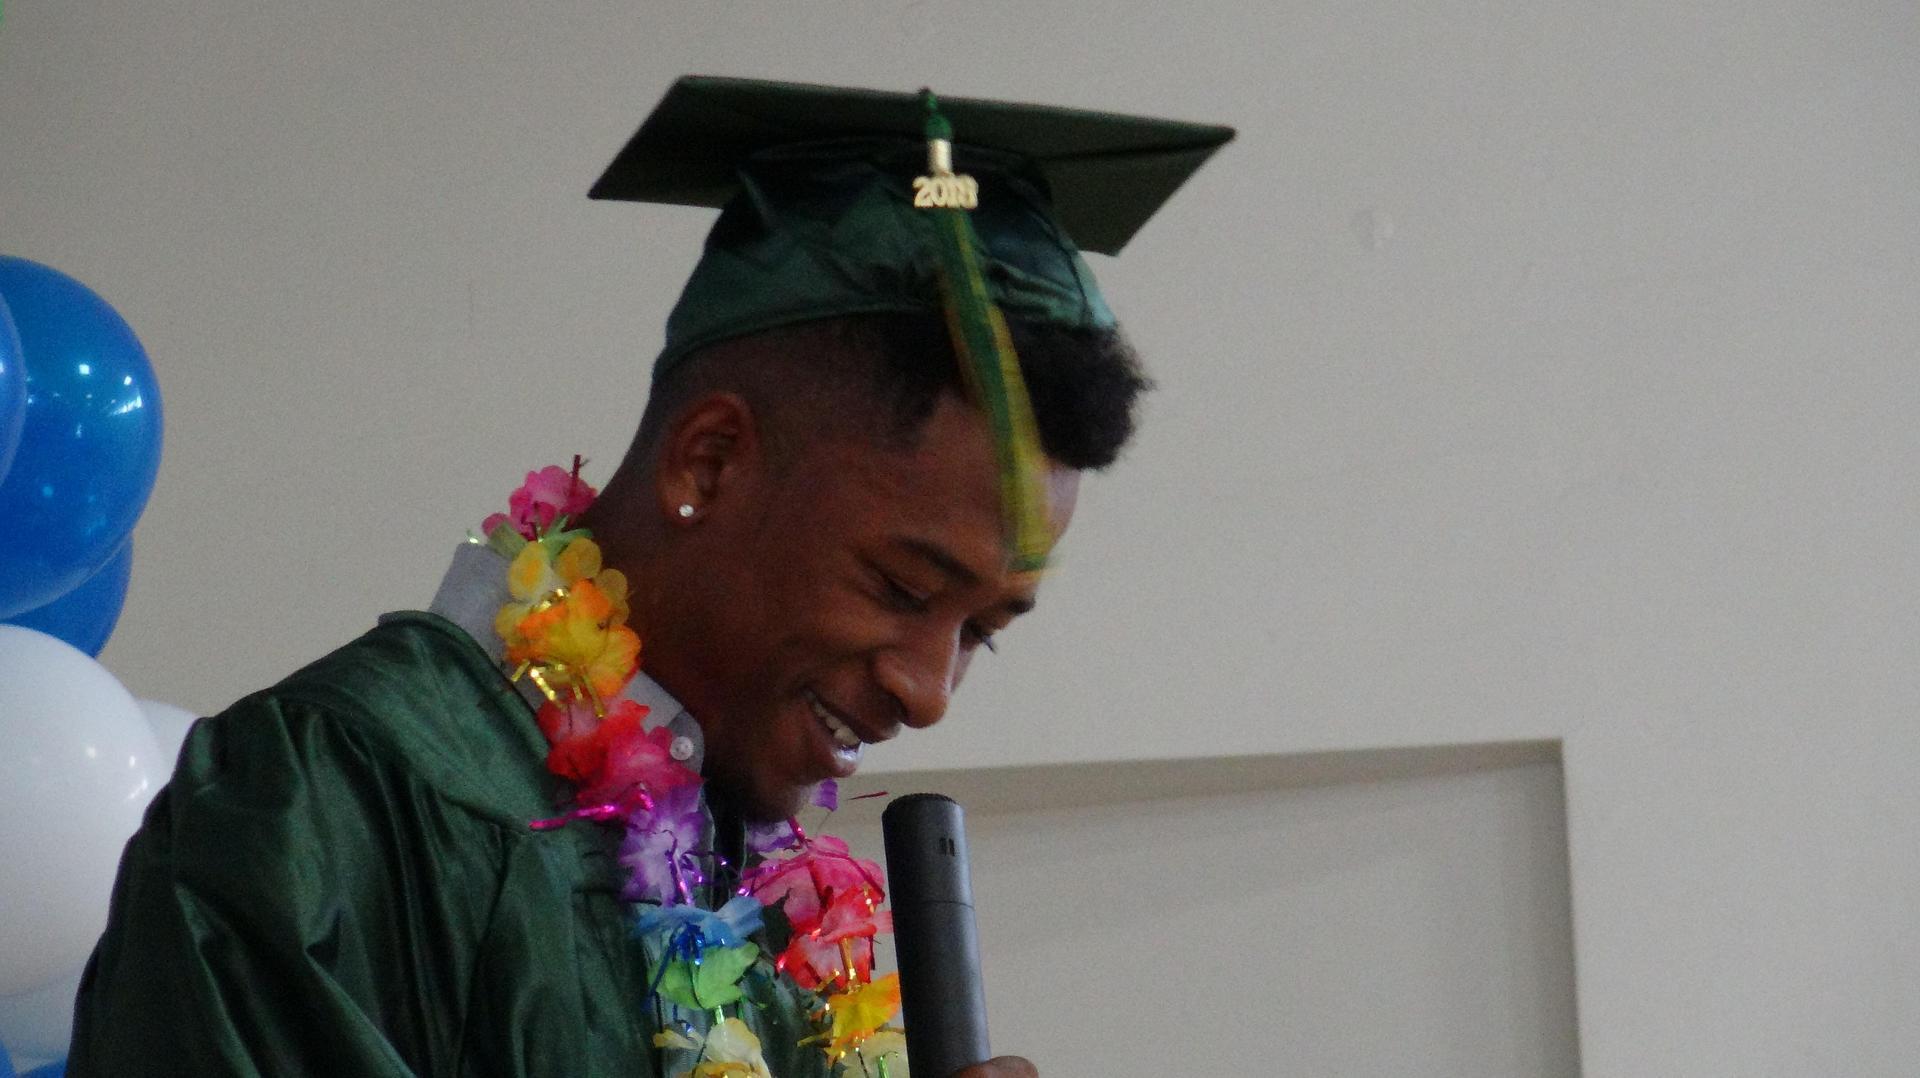 A San Diego grad giving a speech